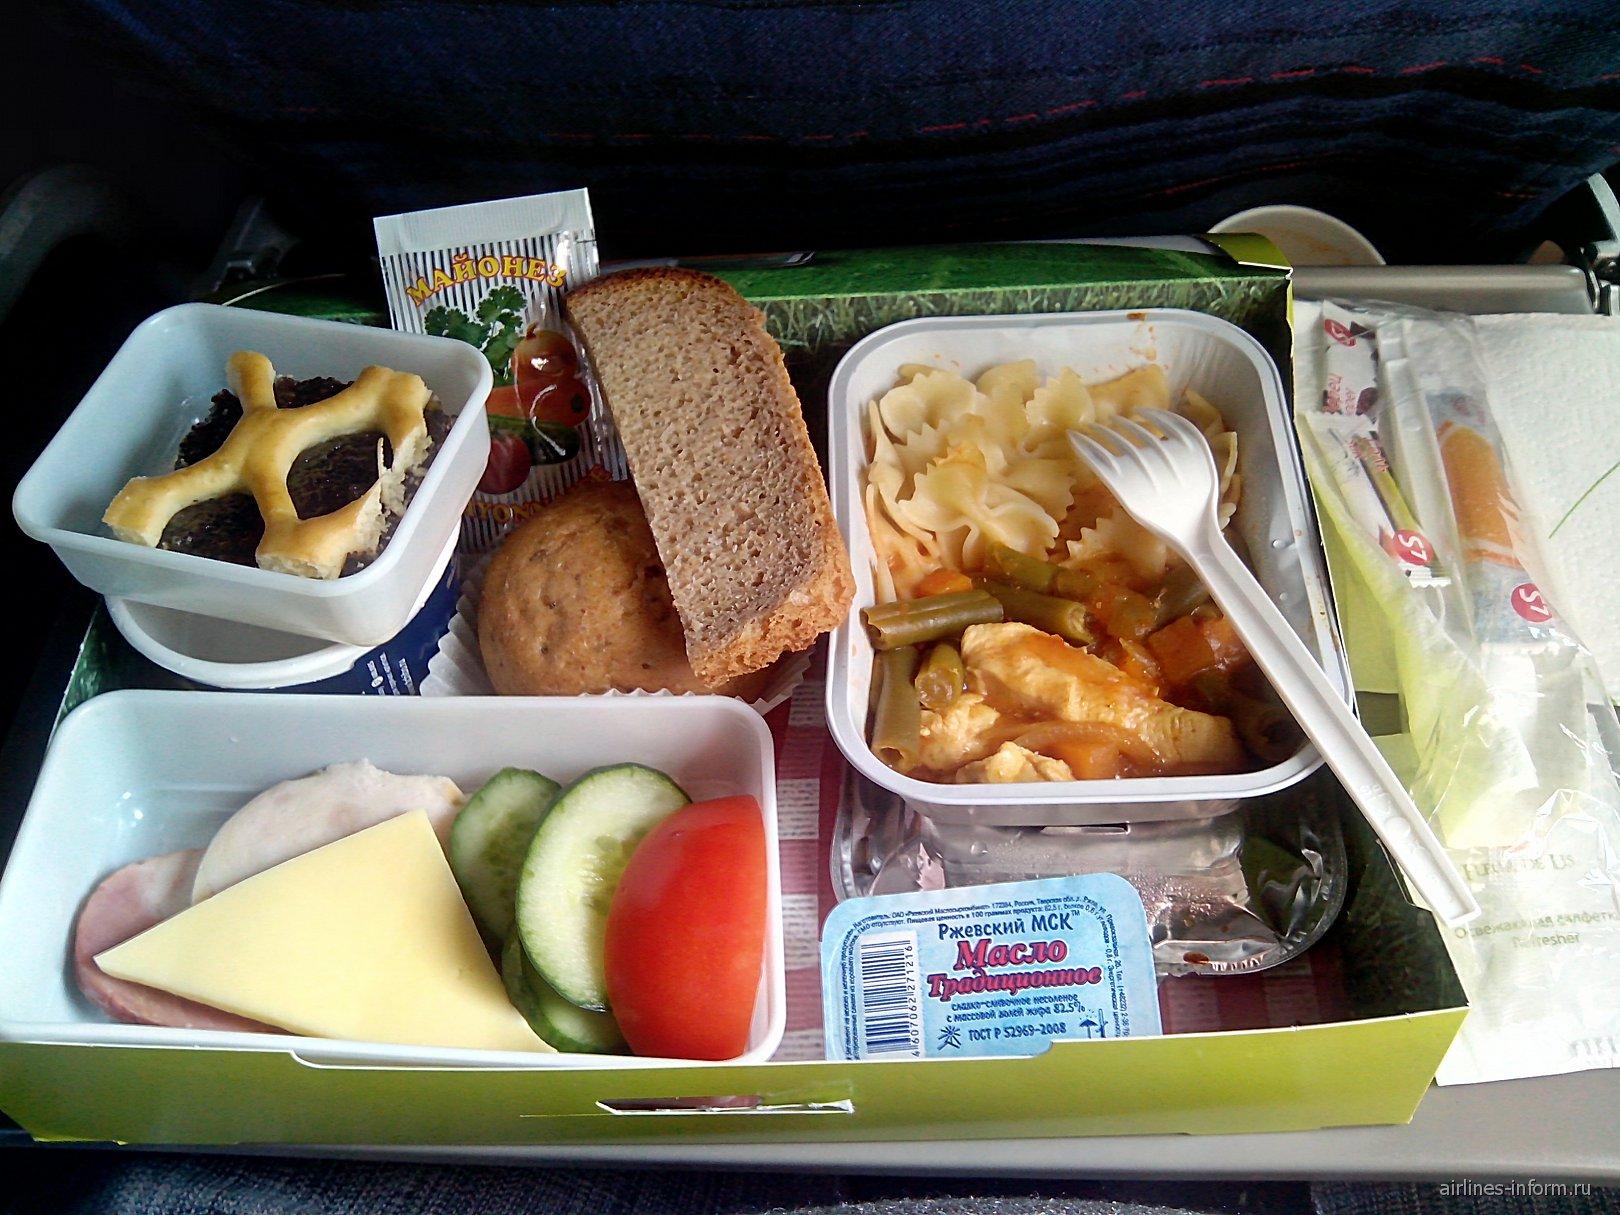 Питание на рейсе авиакомпании Сибирь Омск-Москва